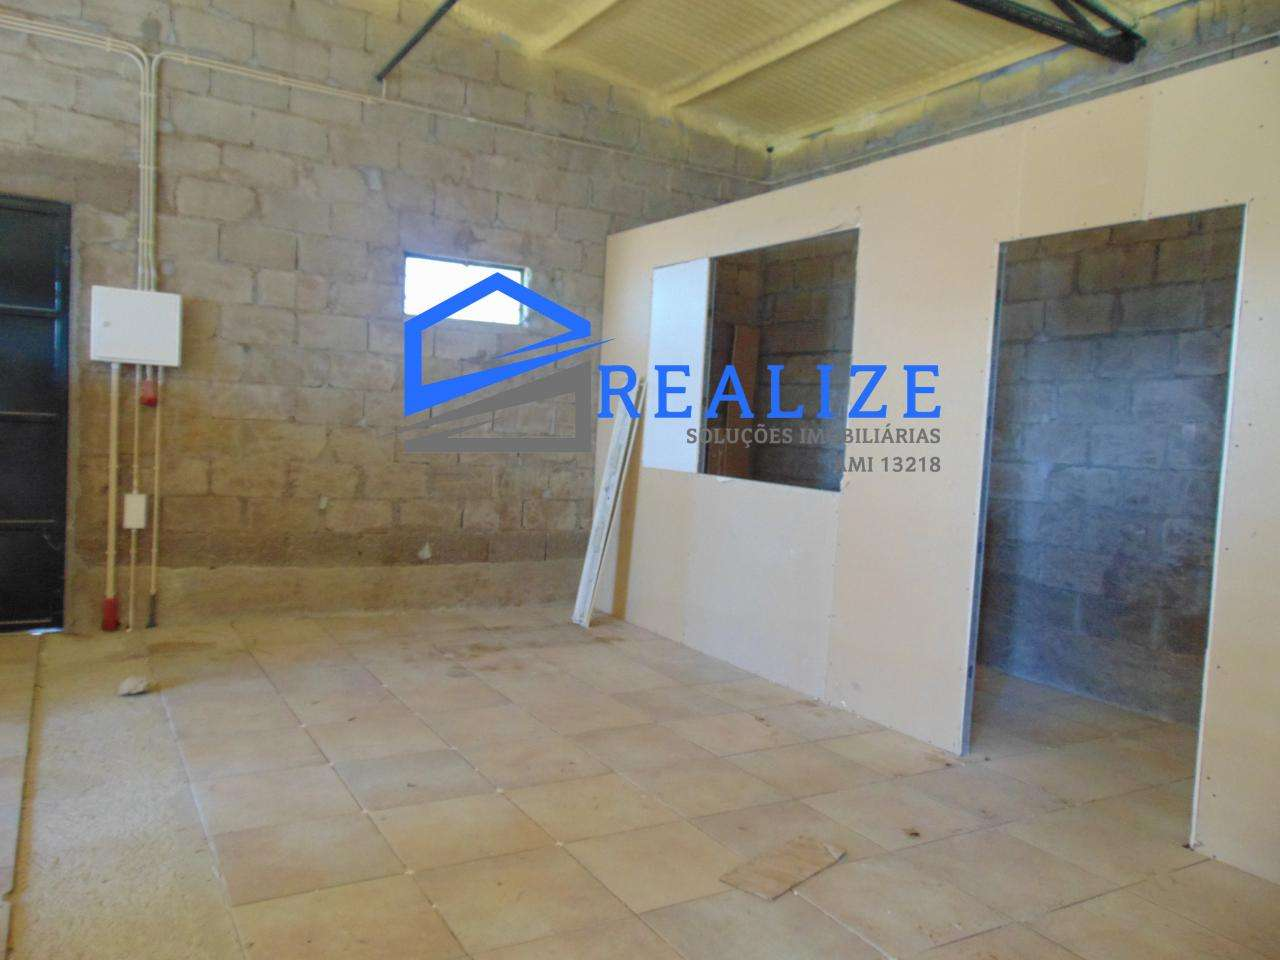 Armazém para arrendar, Borbela e Lamas de Olo, Vila Real - Foto 8